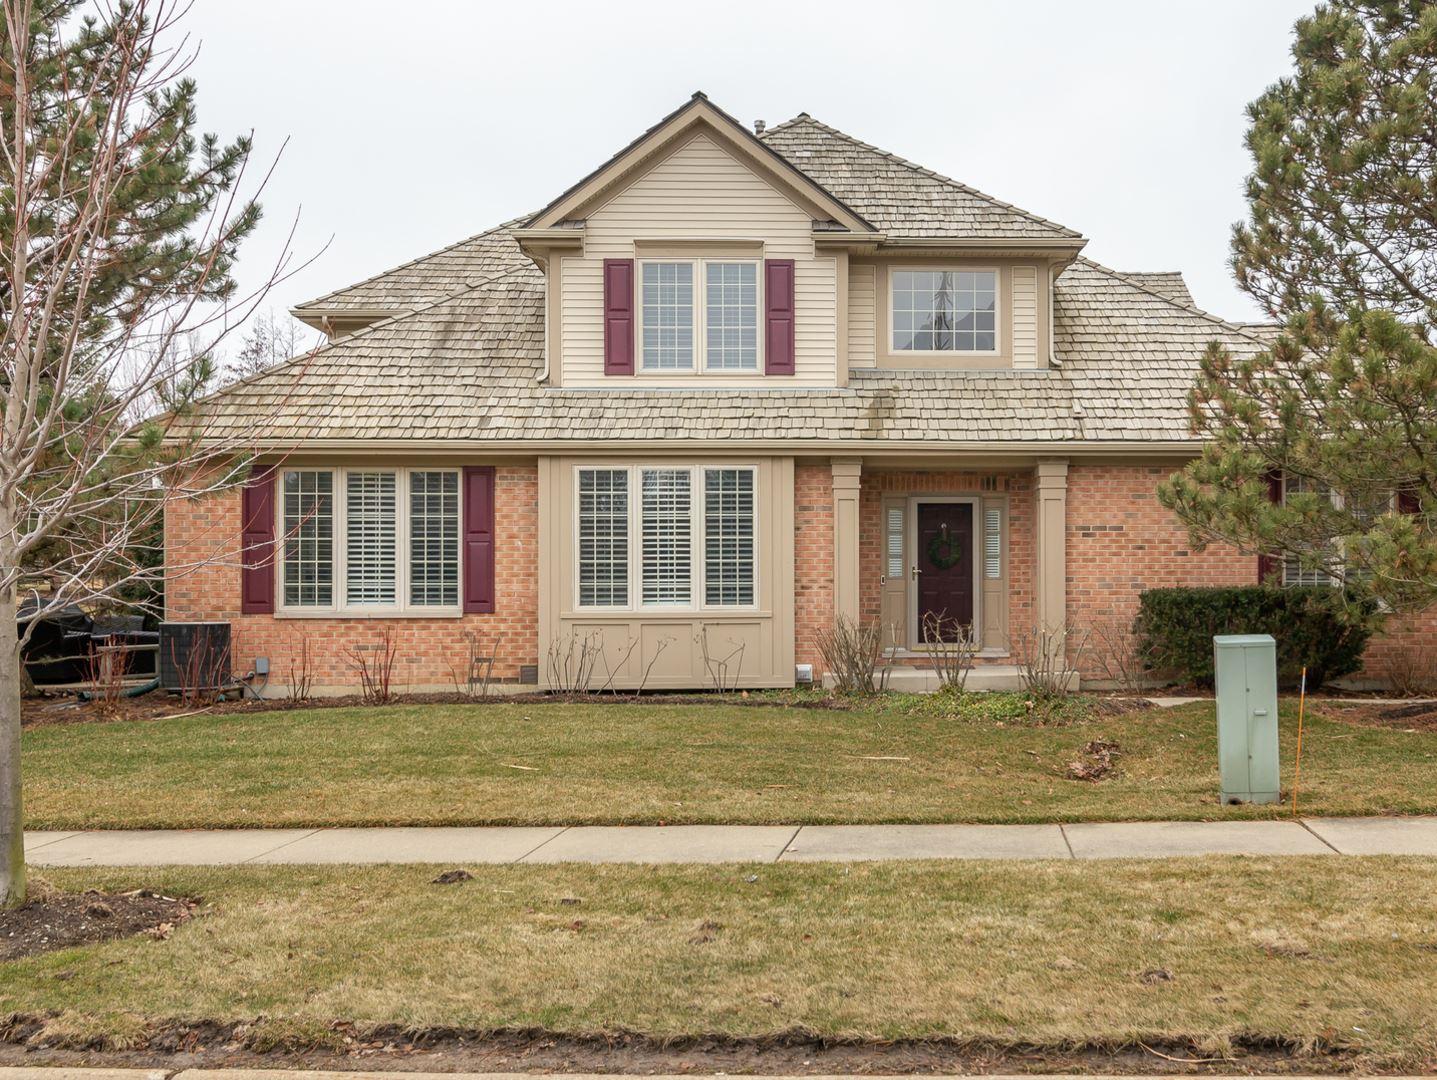 1771 Brush Hill Lane, Glenview, IL 60025 - #: 10666823